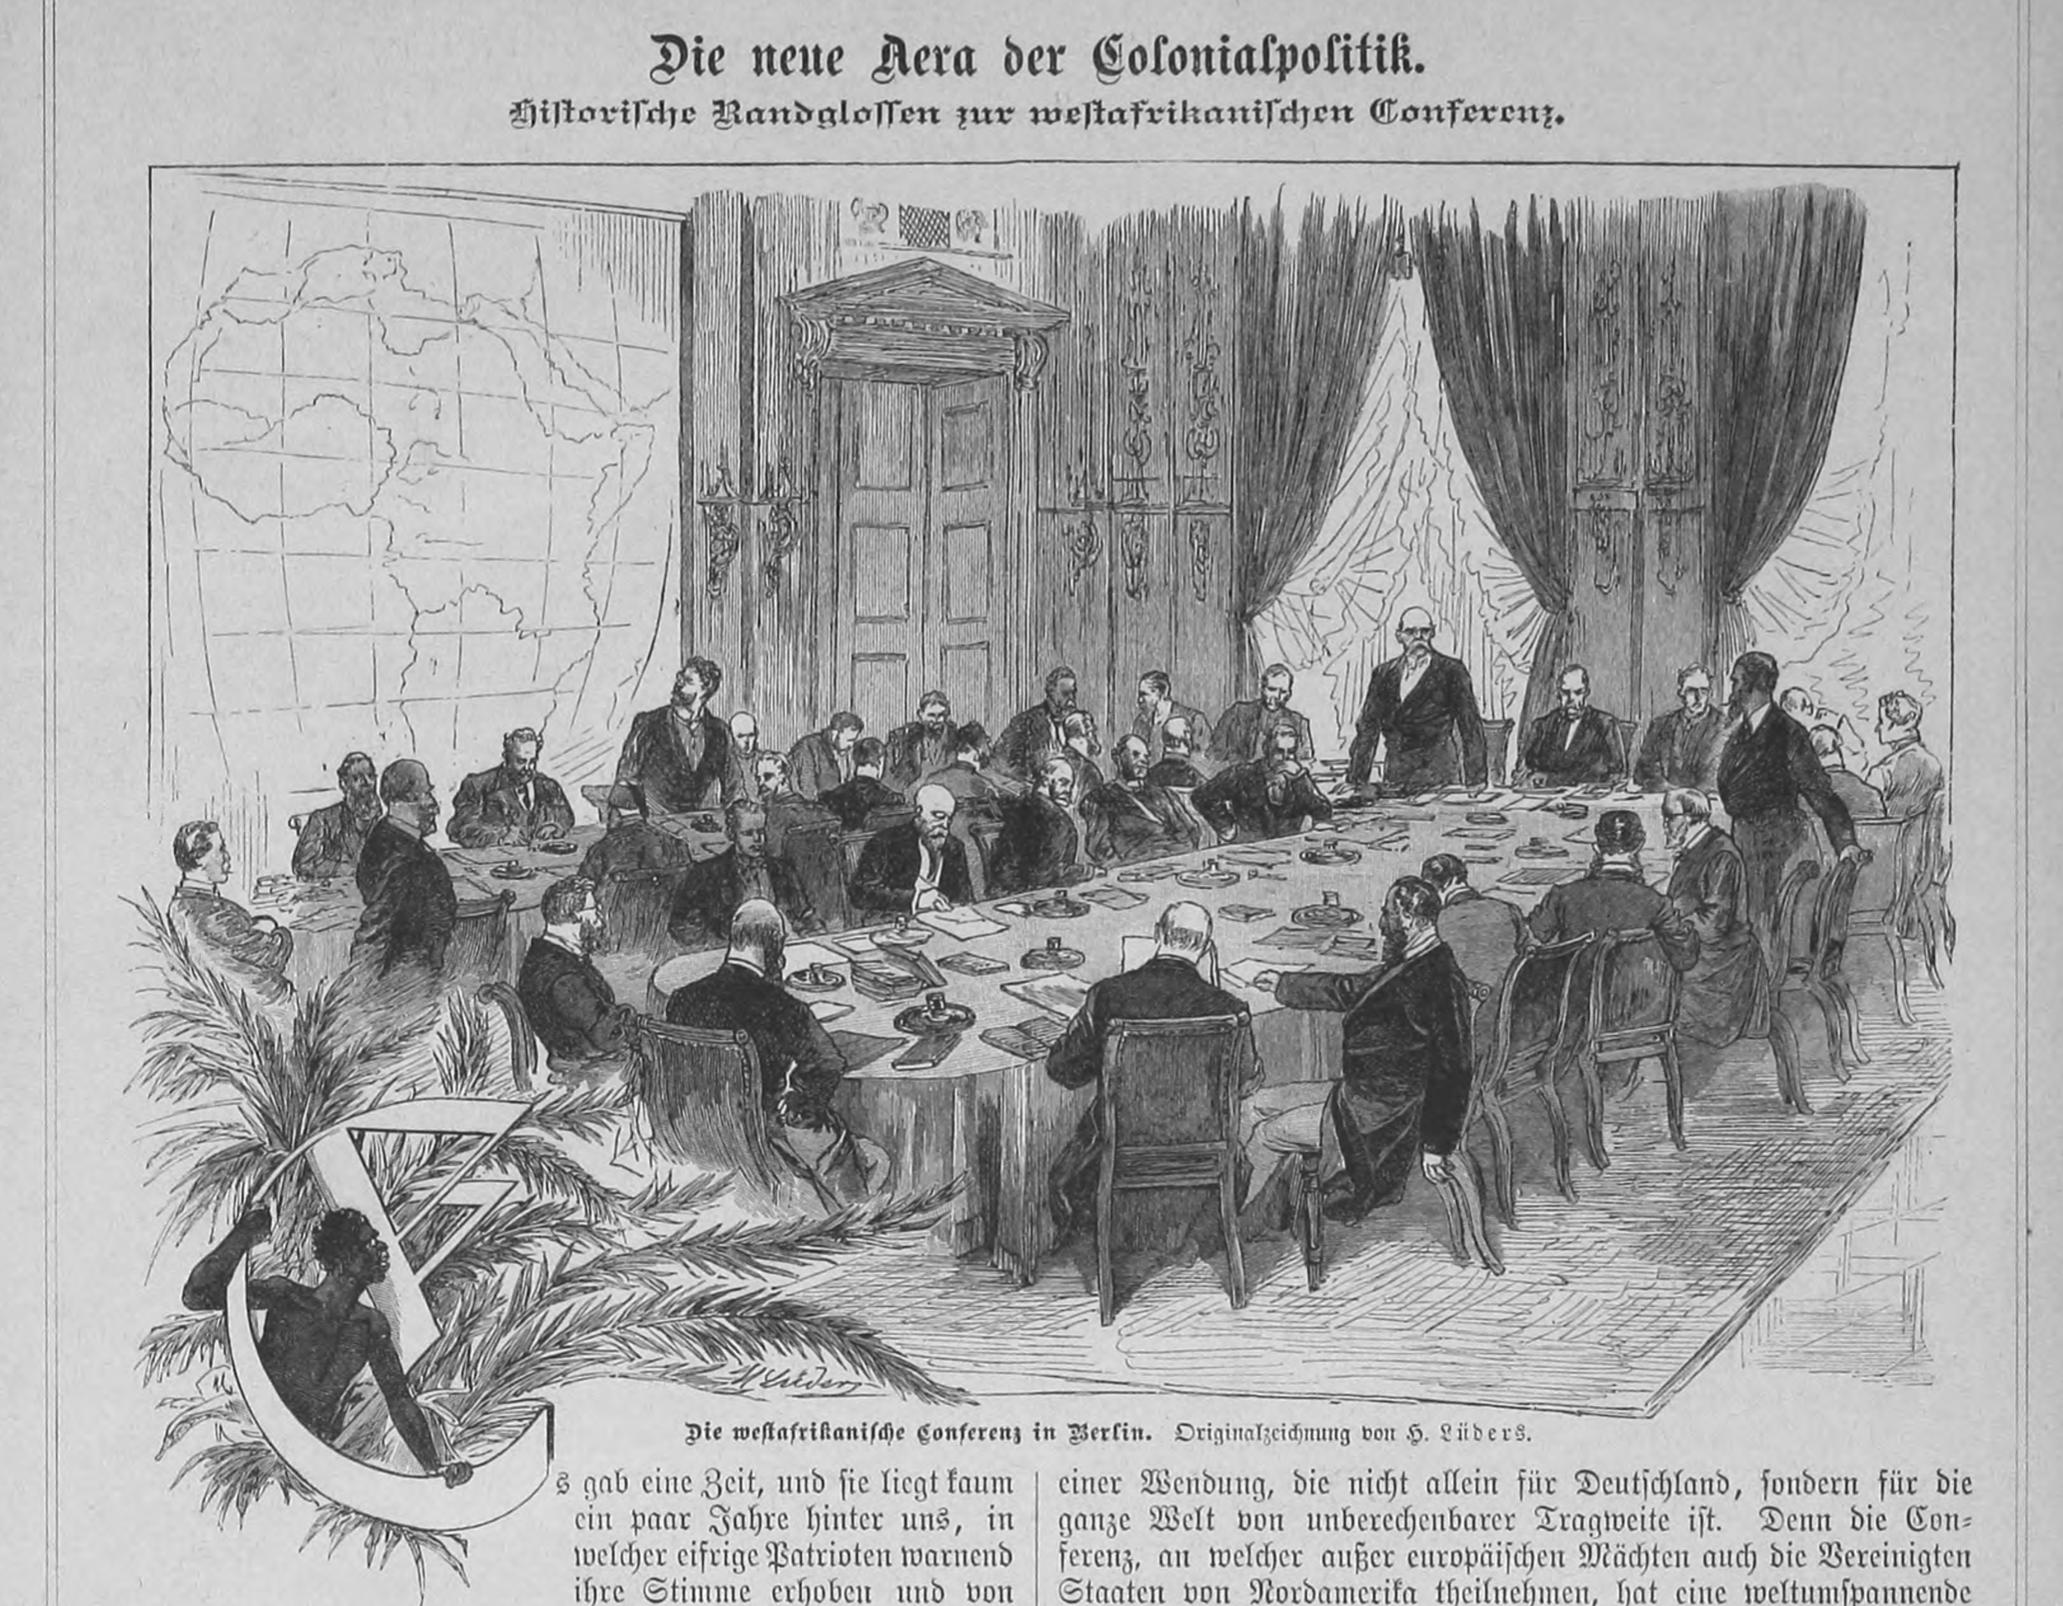 congo-konferenz-1884.png